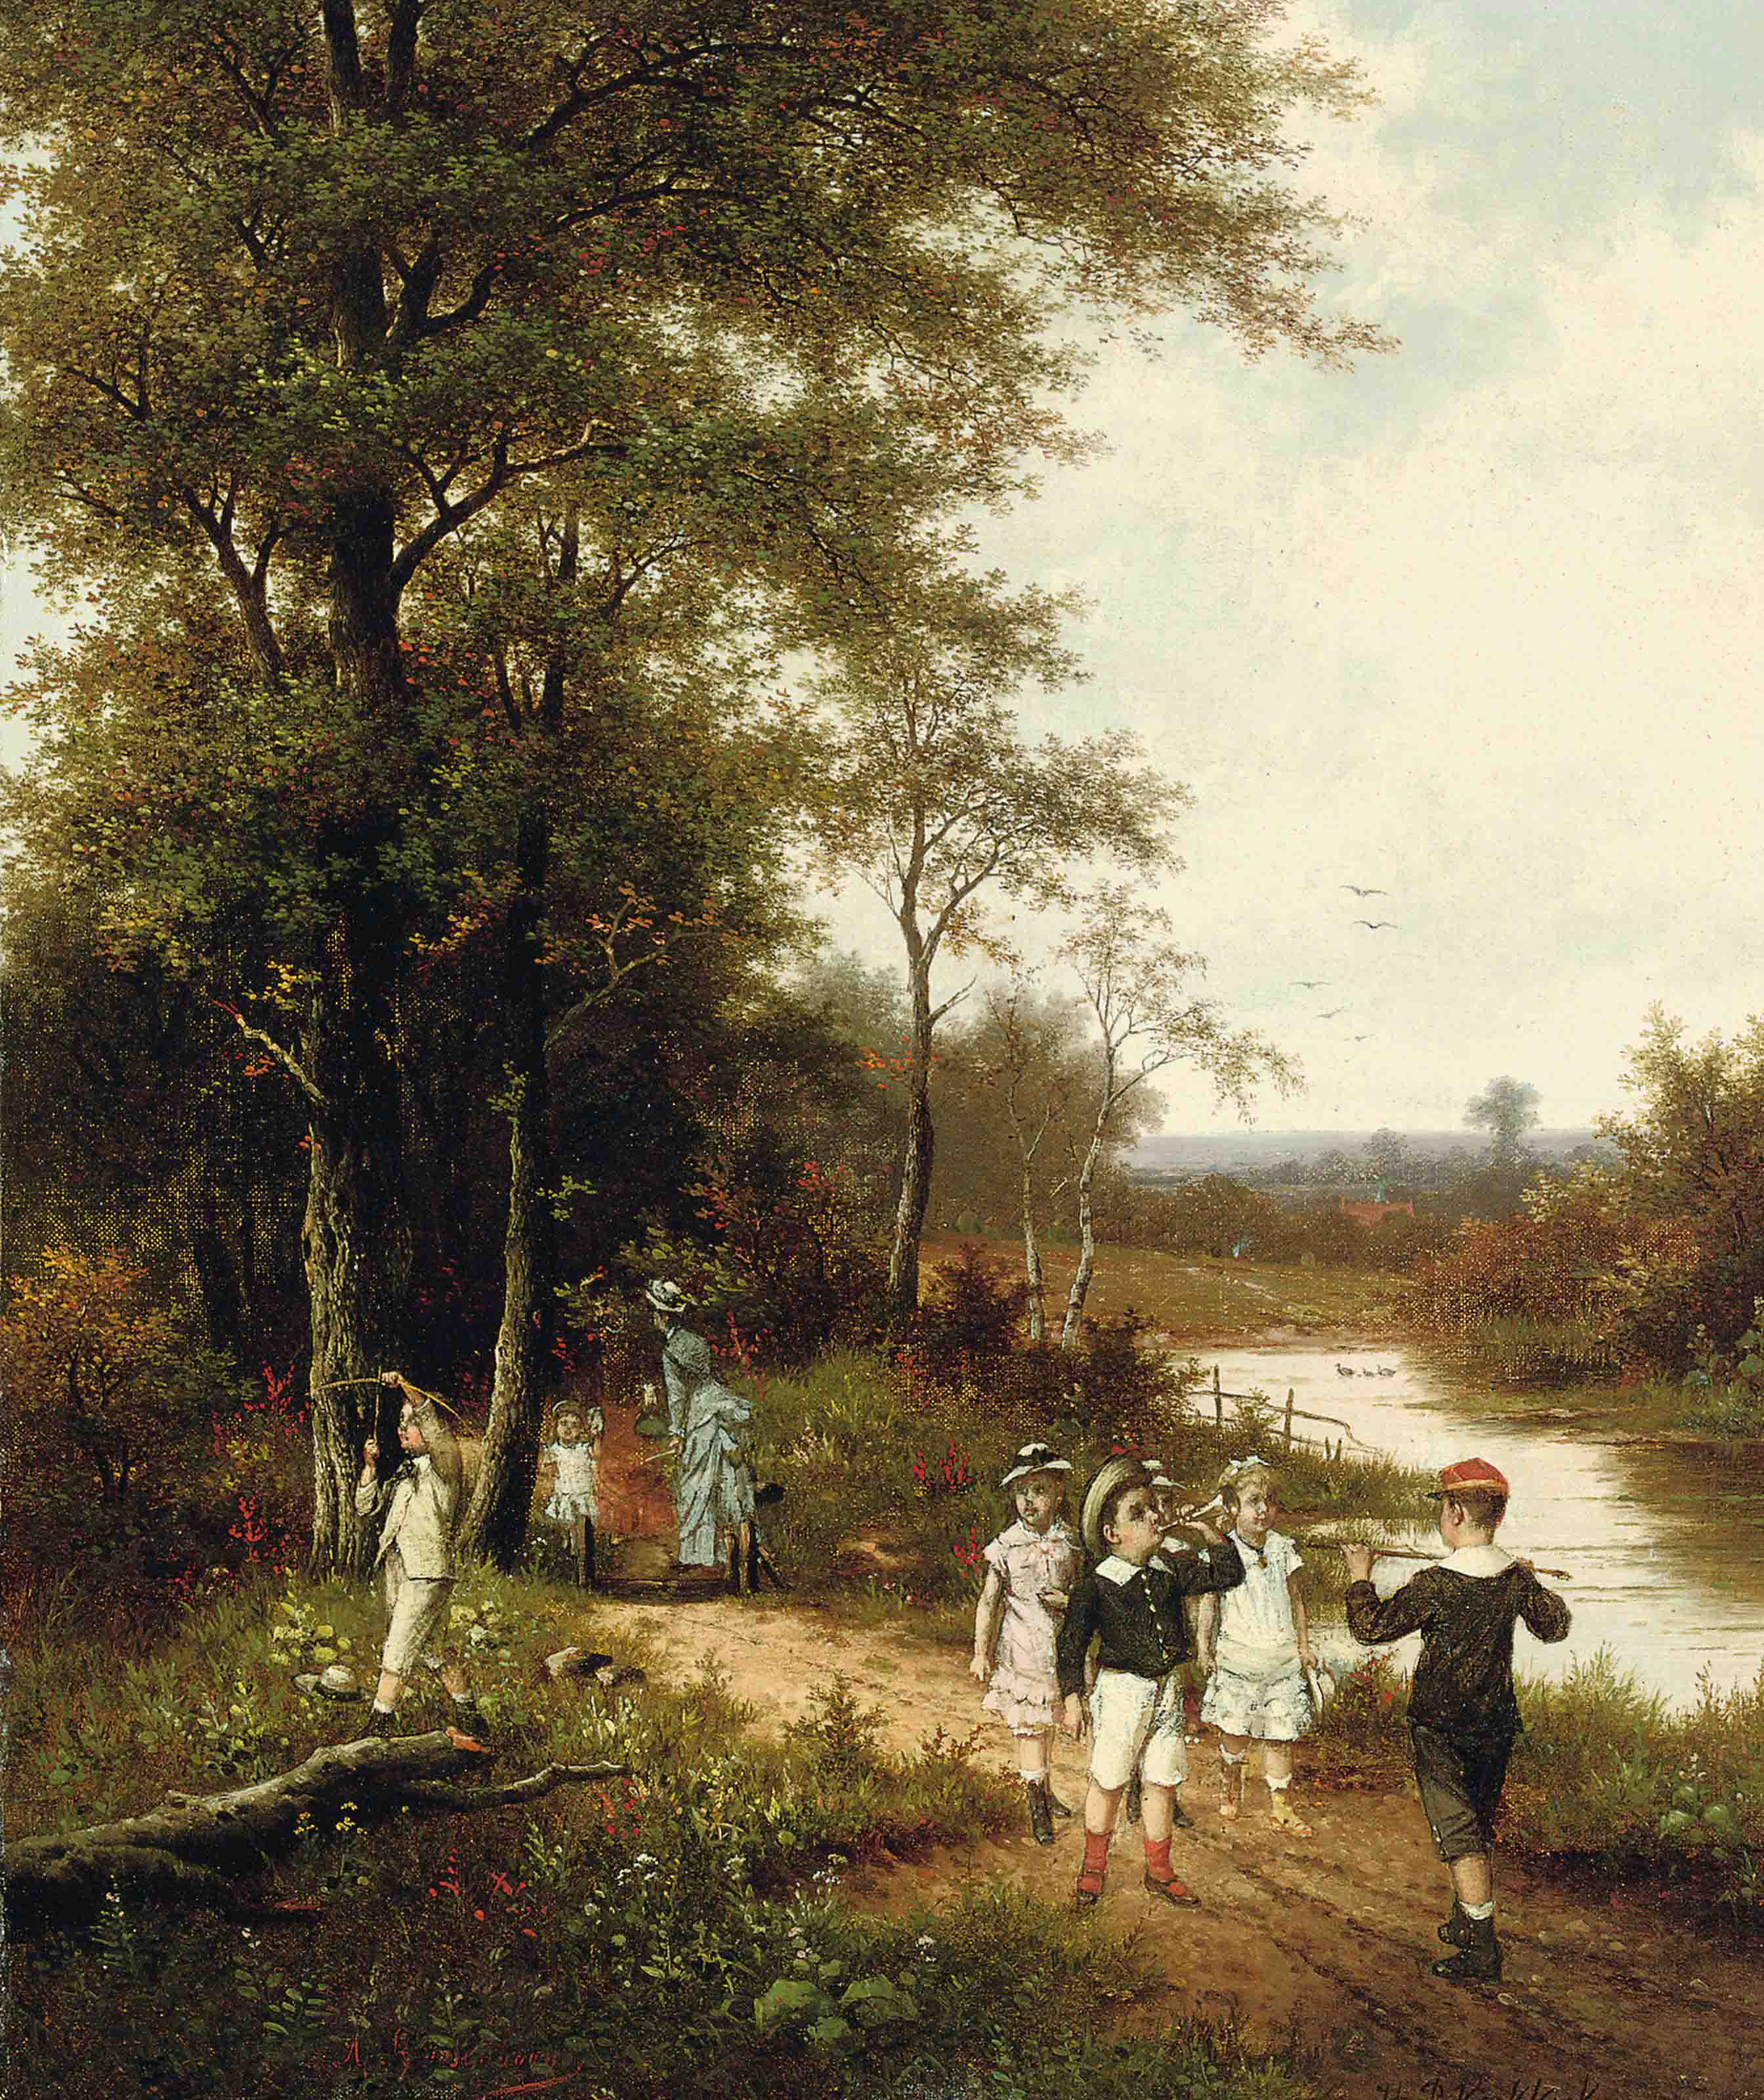 The river patrol